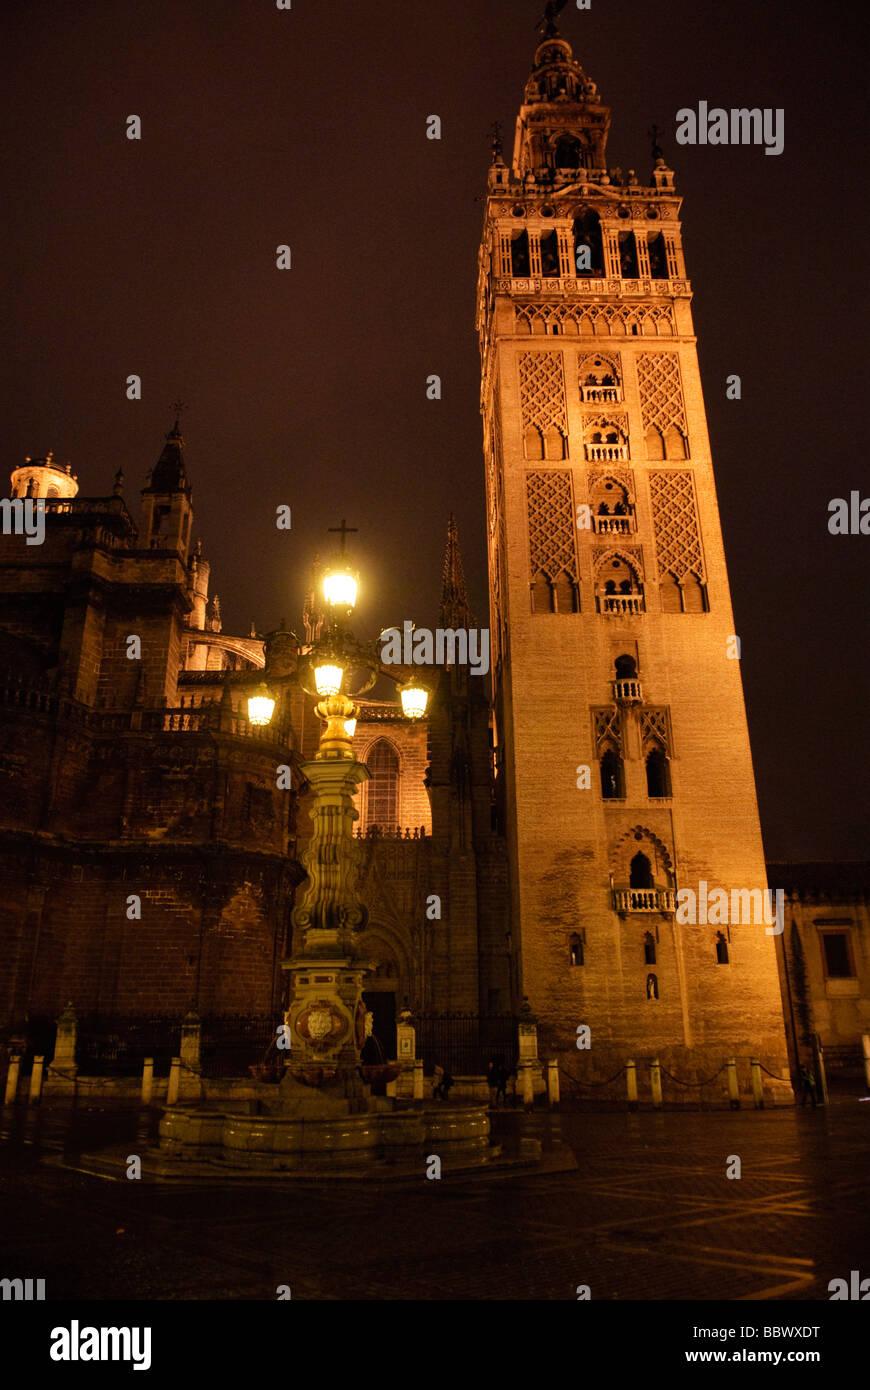 Torre iluminada de La Giralda, Catedral de noche en Sevilla Andalucía España Imagen De Stock